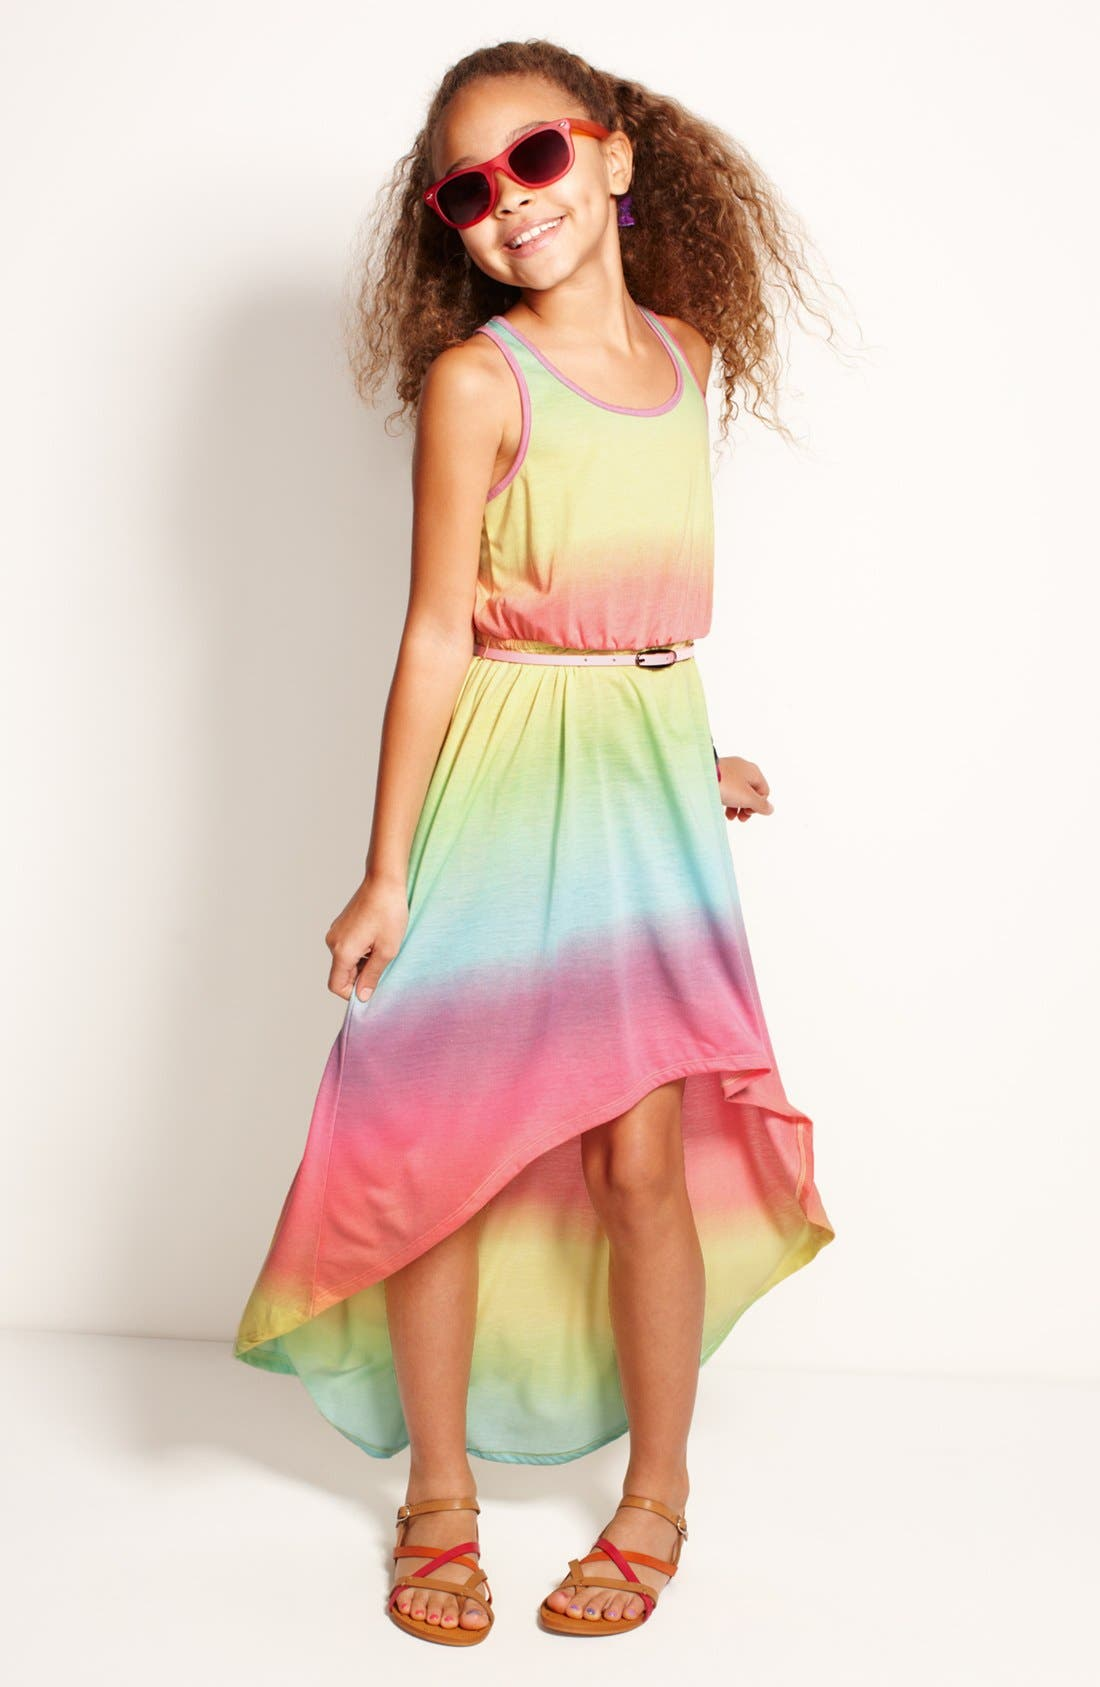 Main Image - Fire Tie Dye Dress & Accessories (Little Girls & Big Girls)